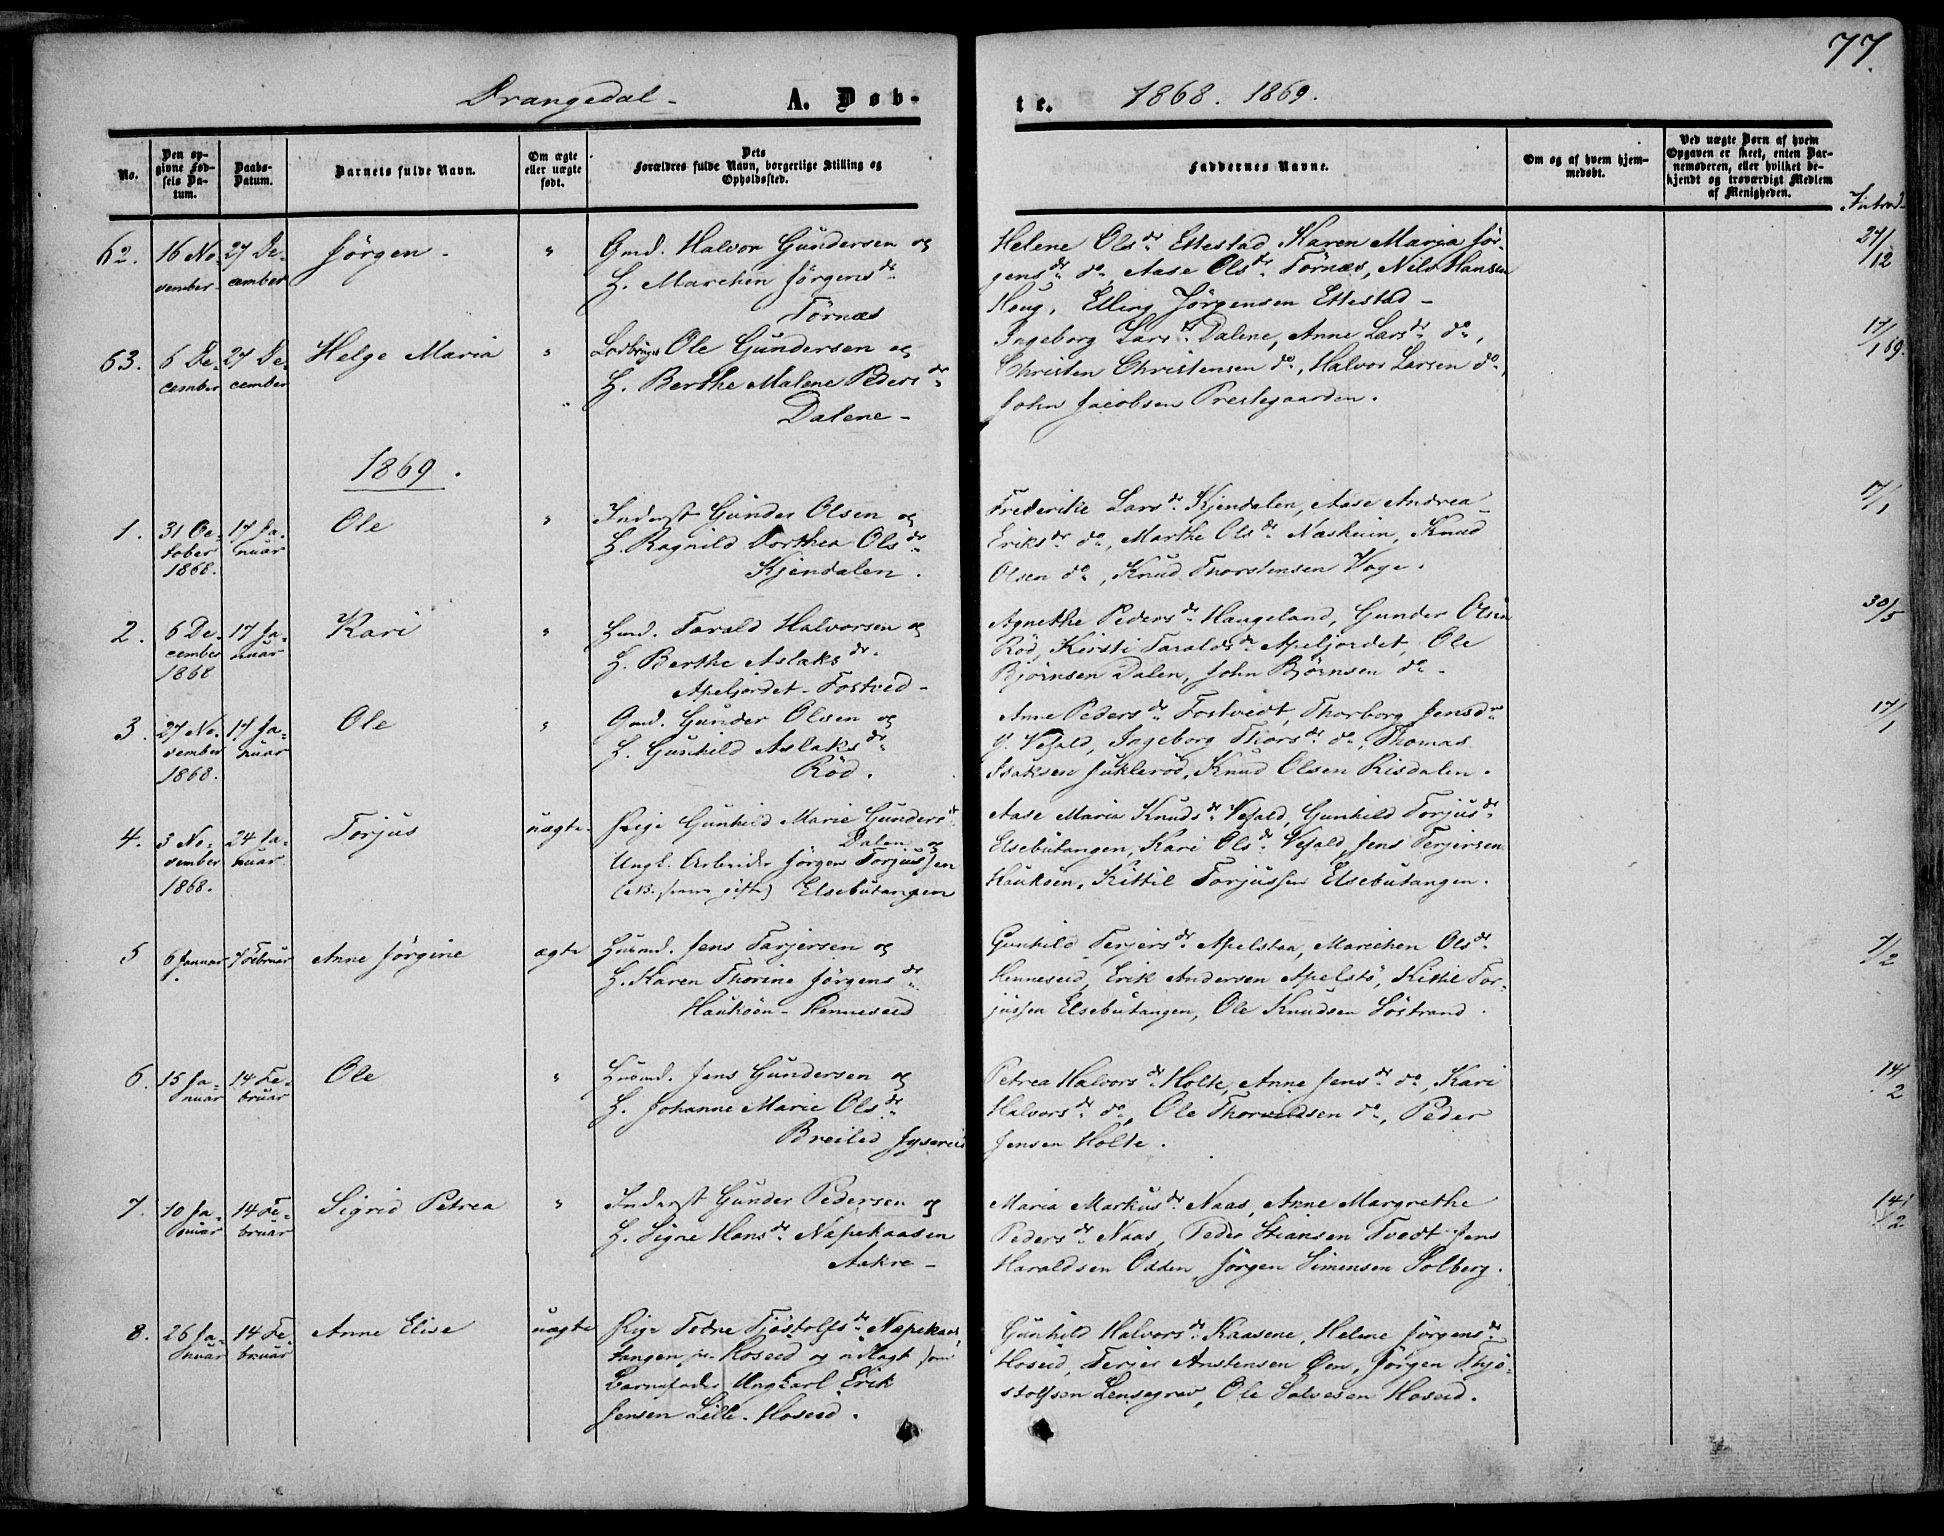 SAKO, Drangedal kirkebøker, F/Fa/L0008: Ministerialbok nr. 8, 1857-1871, s. 77